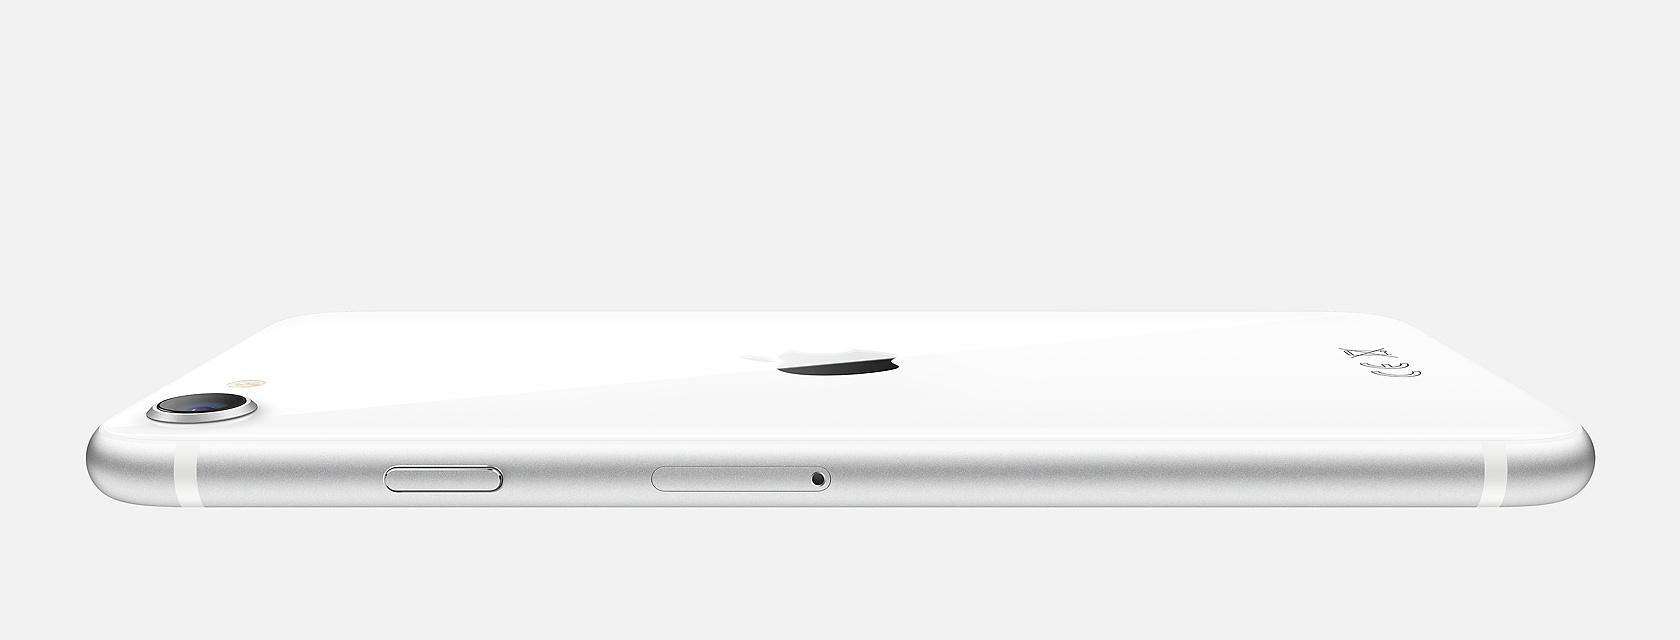 iphone se 2020 64 gb белый